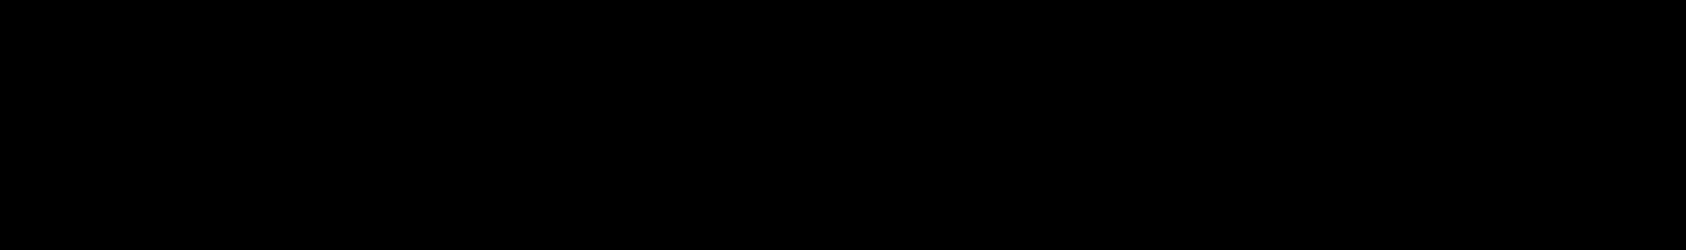 Vasakronan logga